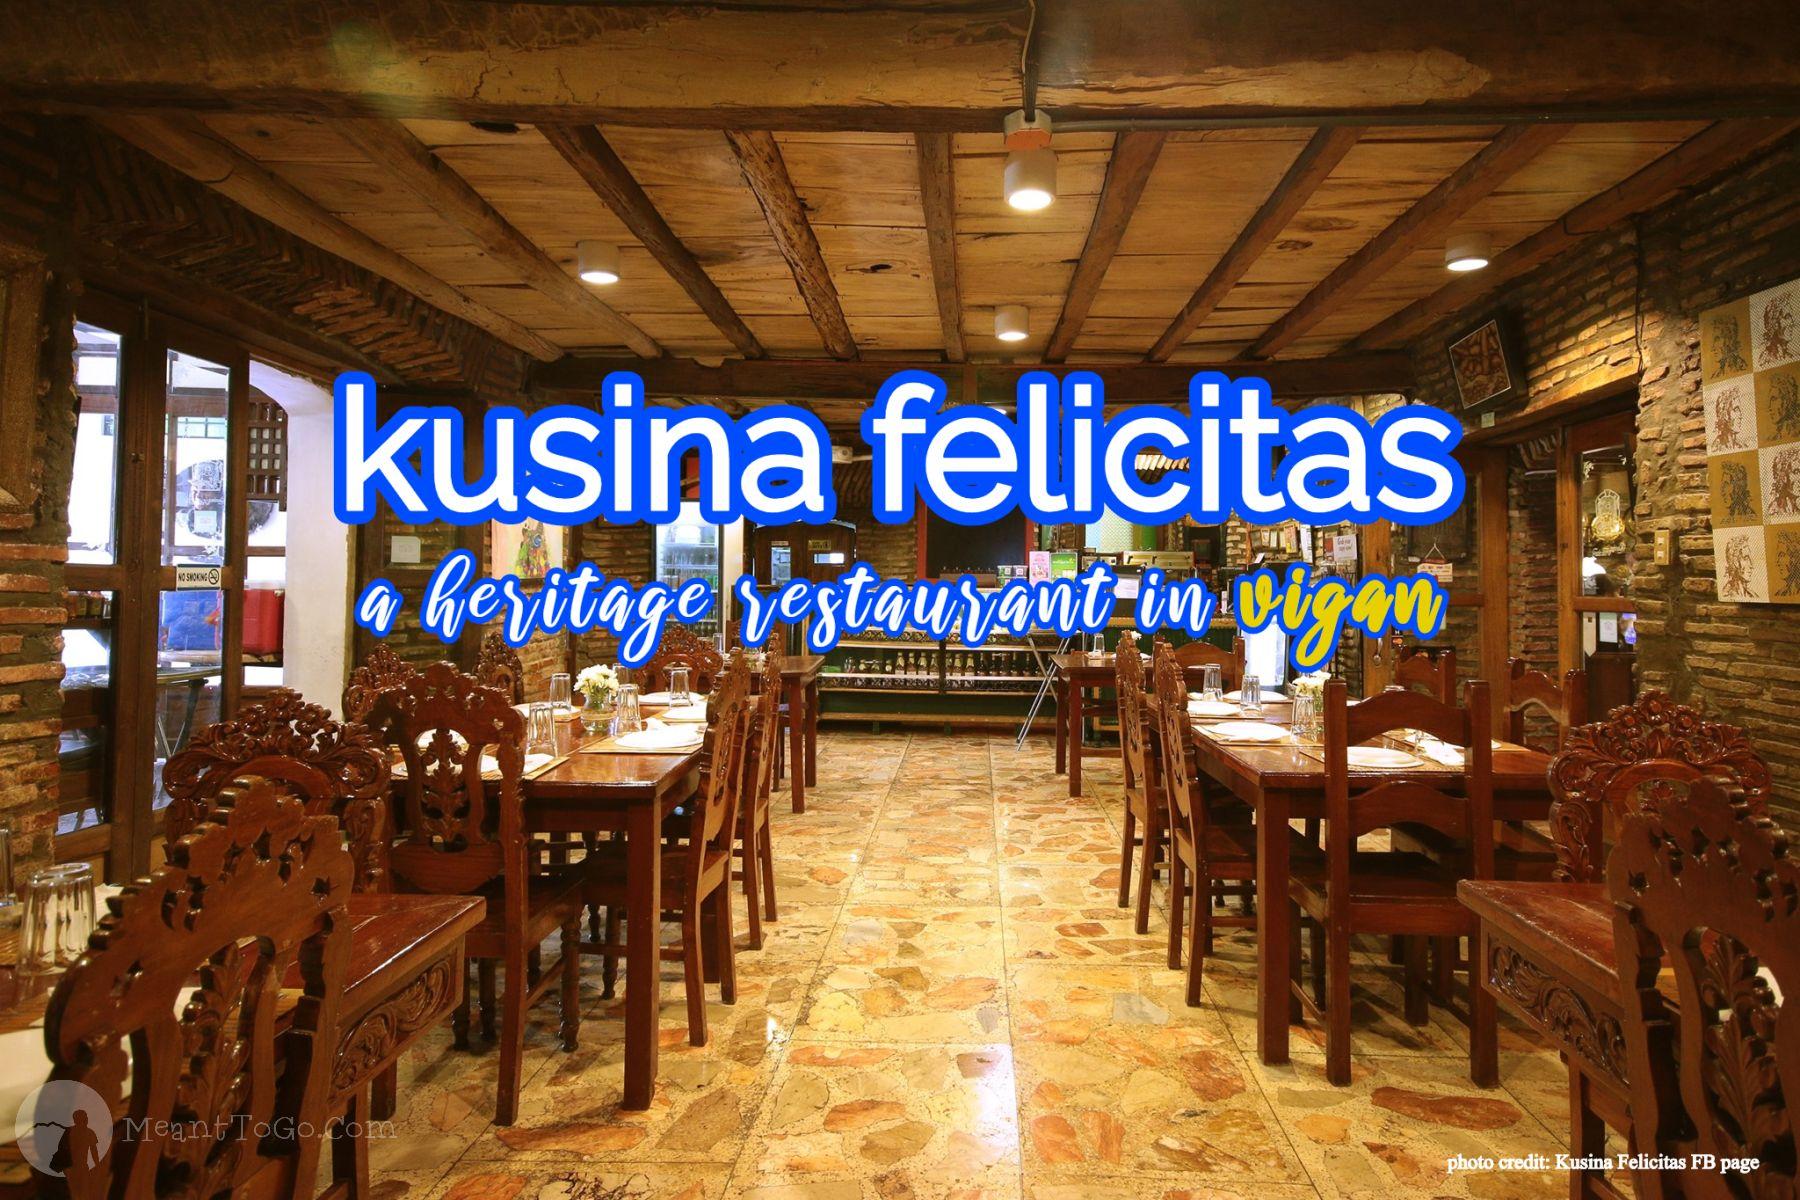 Kusina Felicitas - A Popular Heritage Restaurant In Vigan